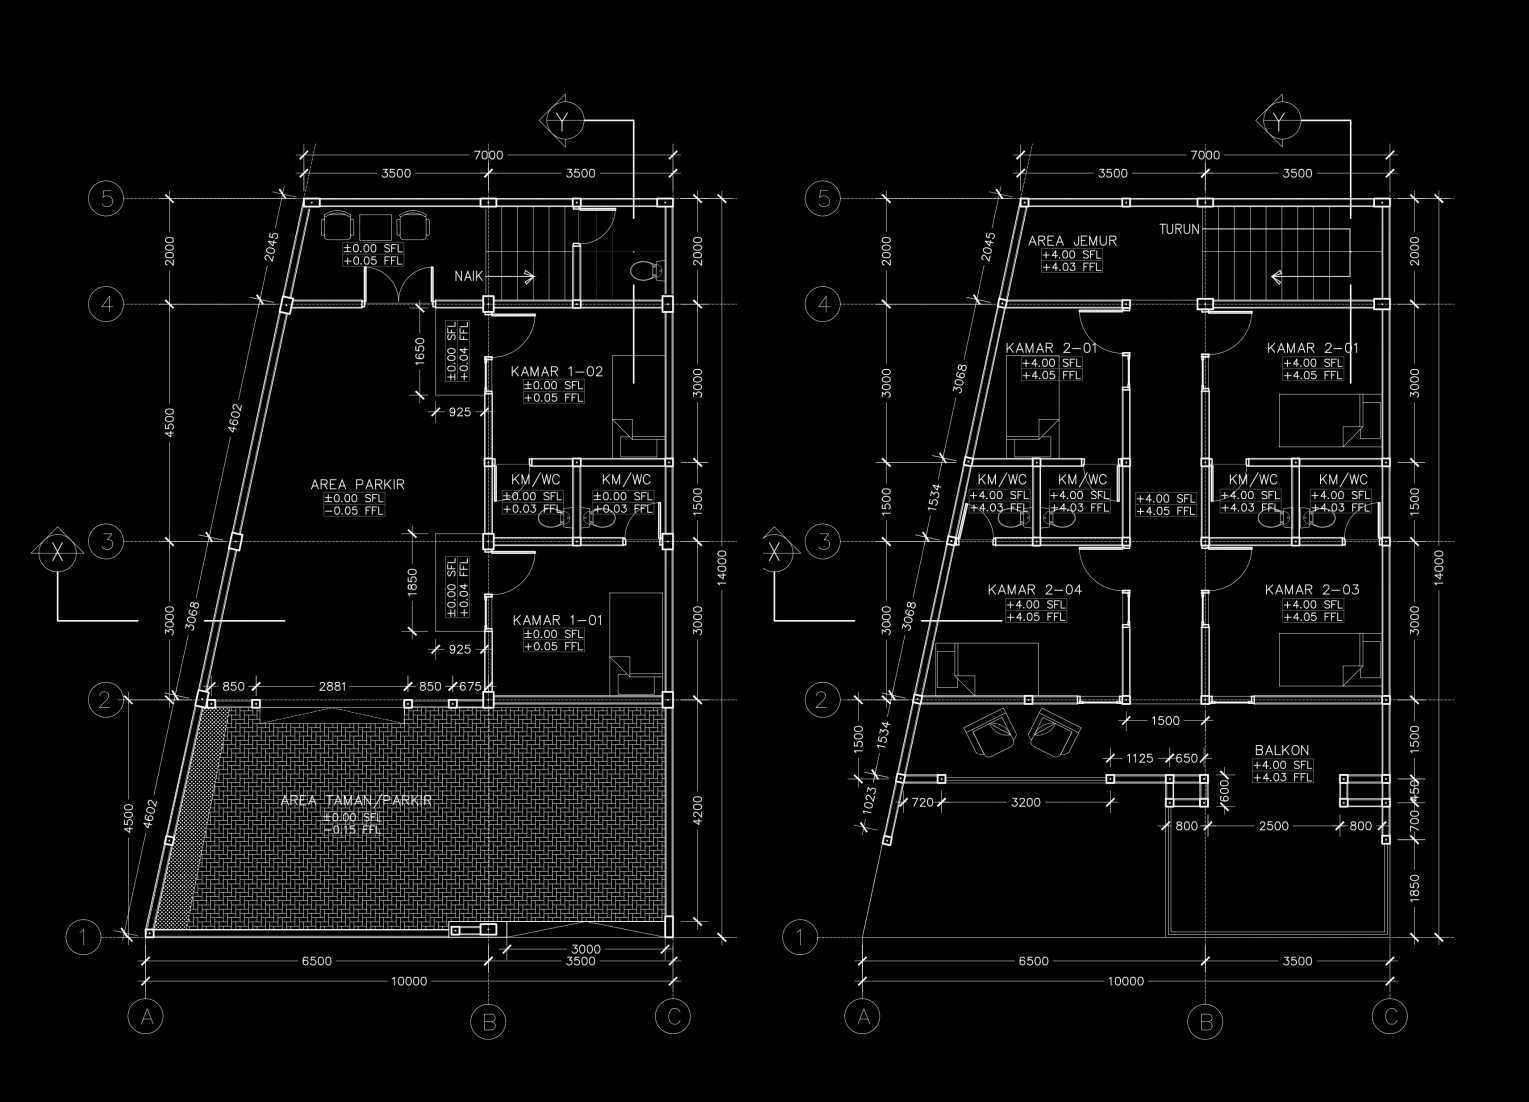 Ashari Architect Studio Desain Kost Bapak Syair Makassar, Kota Makassar, Sulawesi Selatan, Indonesia Makassar, Kota Makassar, Sulawesi Selatan, Indonesia Ashari-Architect-Studio-Desain-Kost-Bapak-Syair   94961